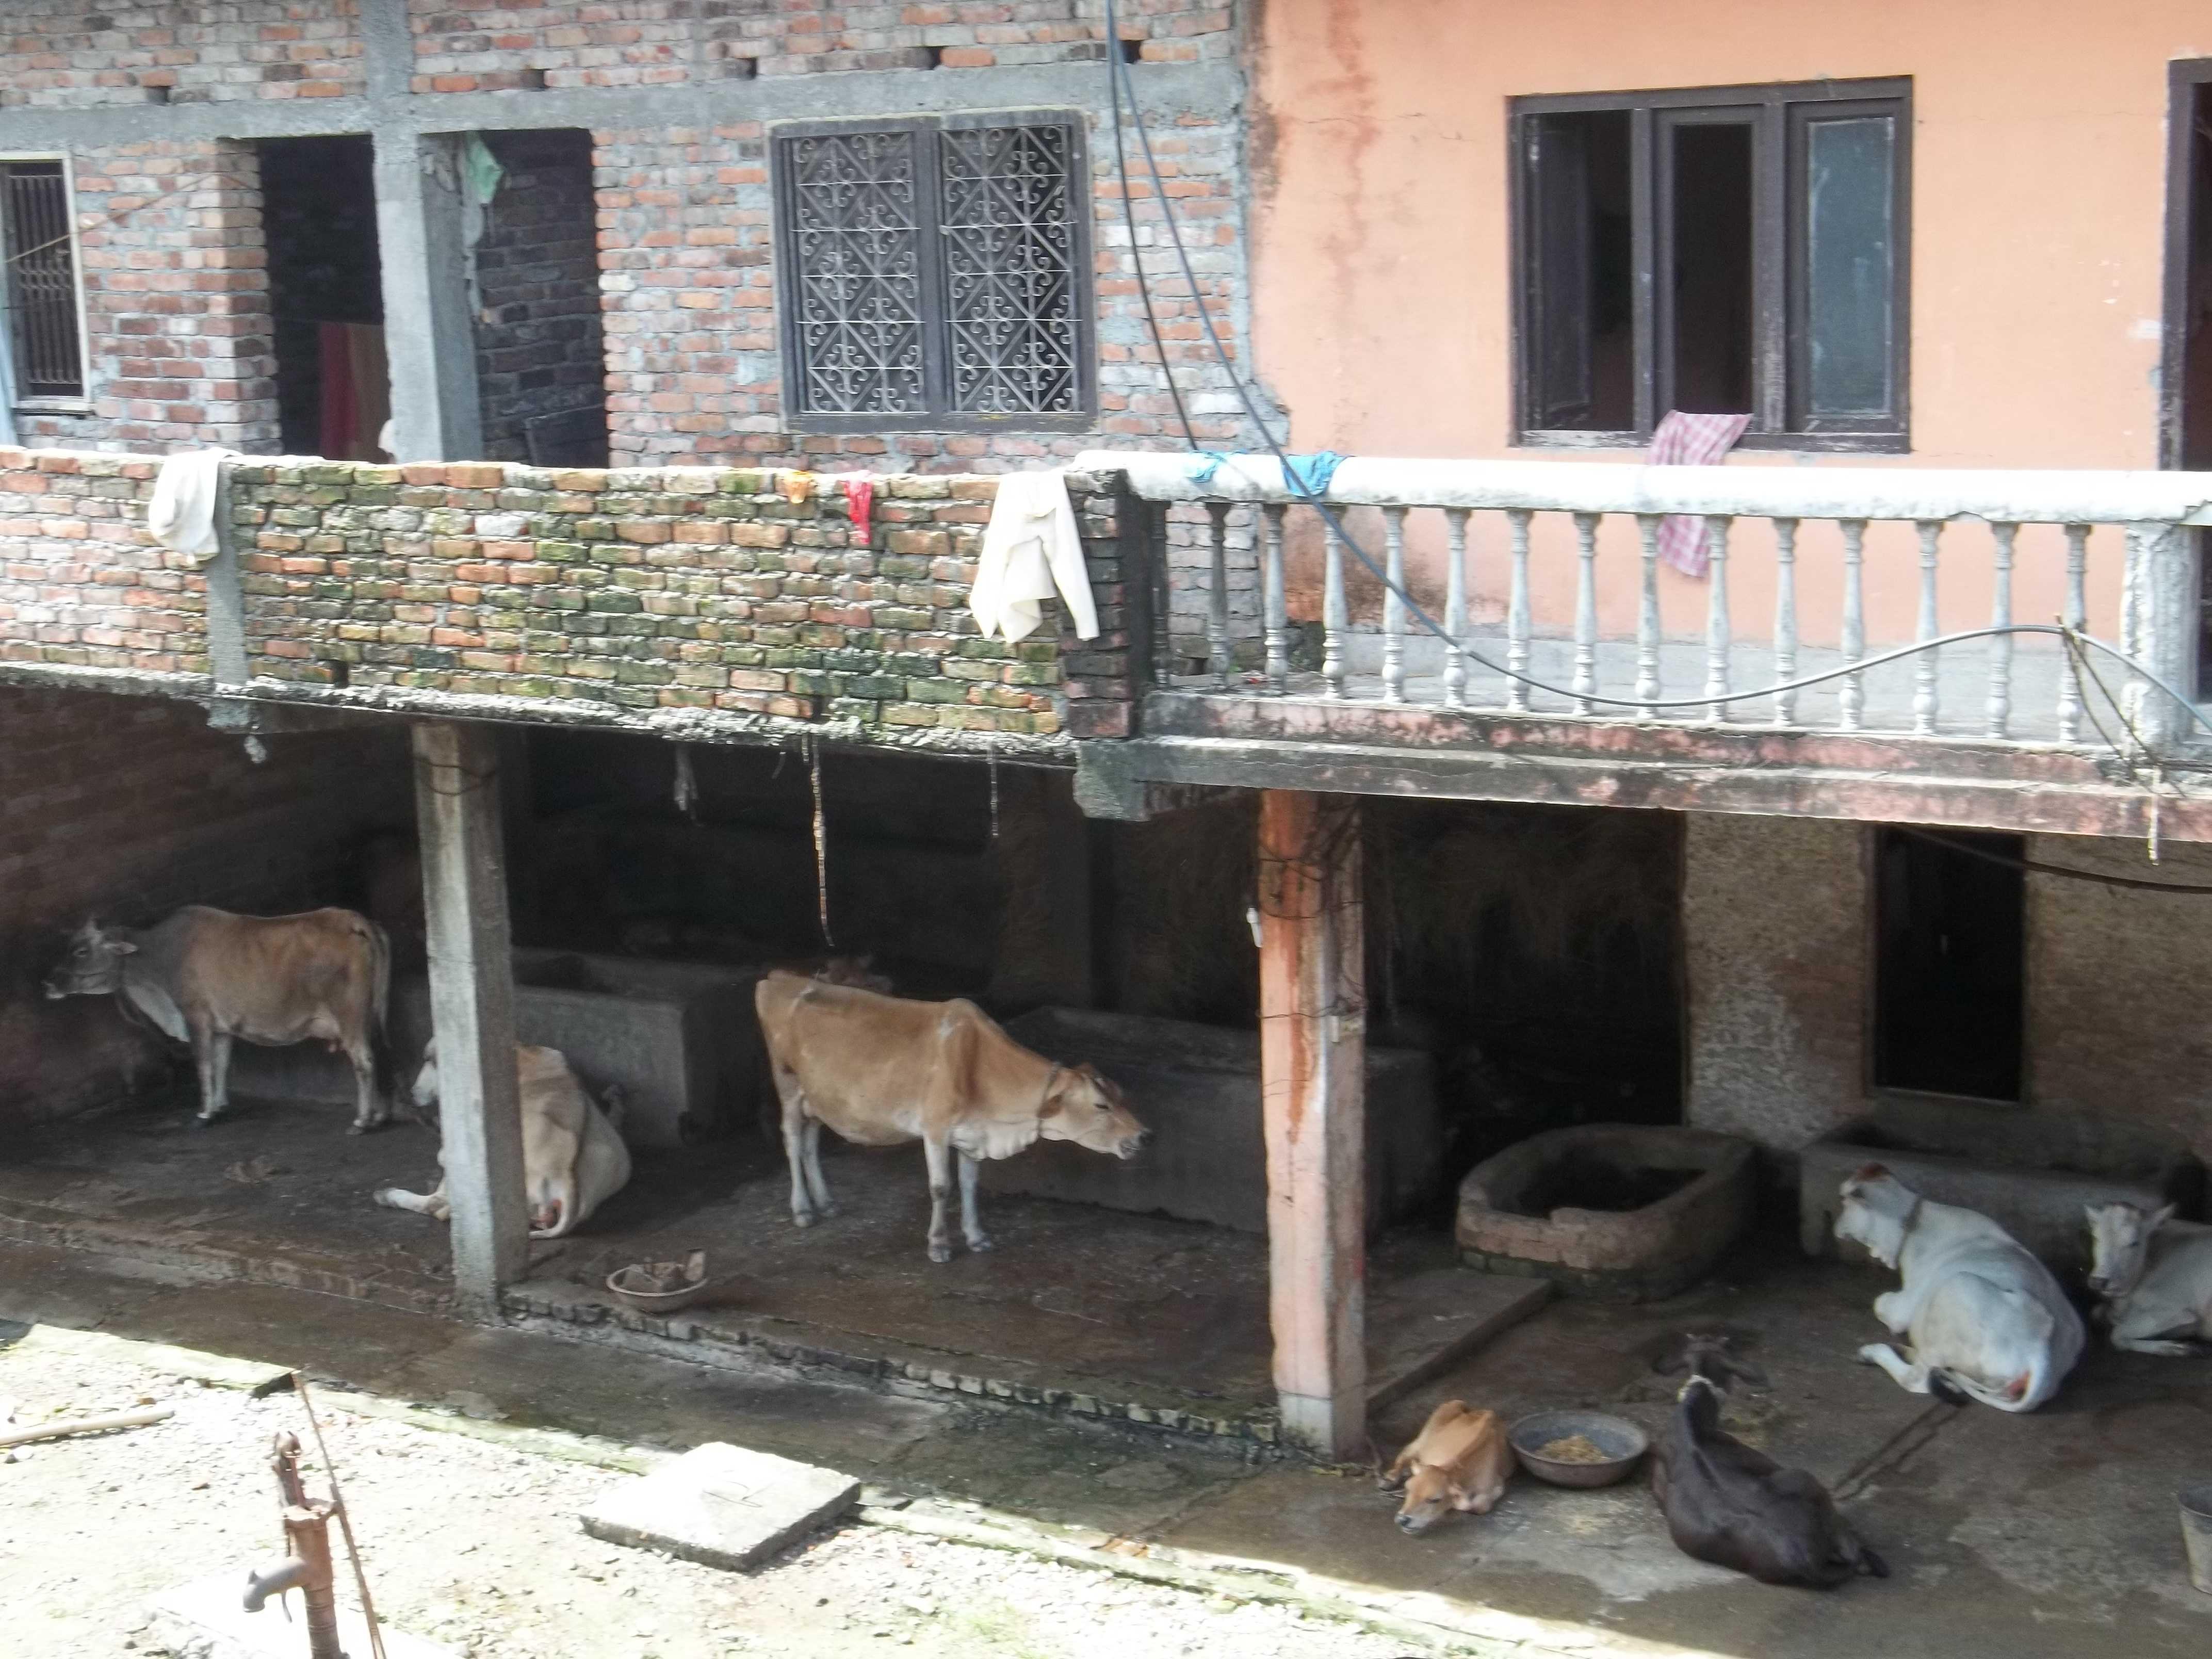 <h3> Gosala at Laxmi Narayan temple at Birat Nagar, Nepal</h3>